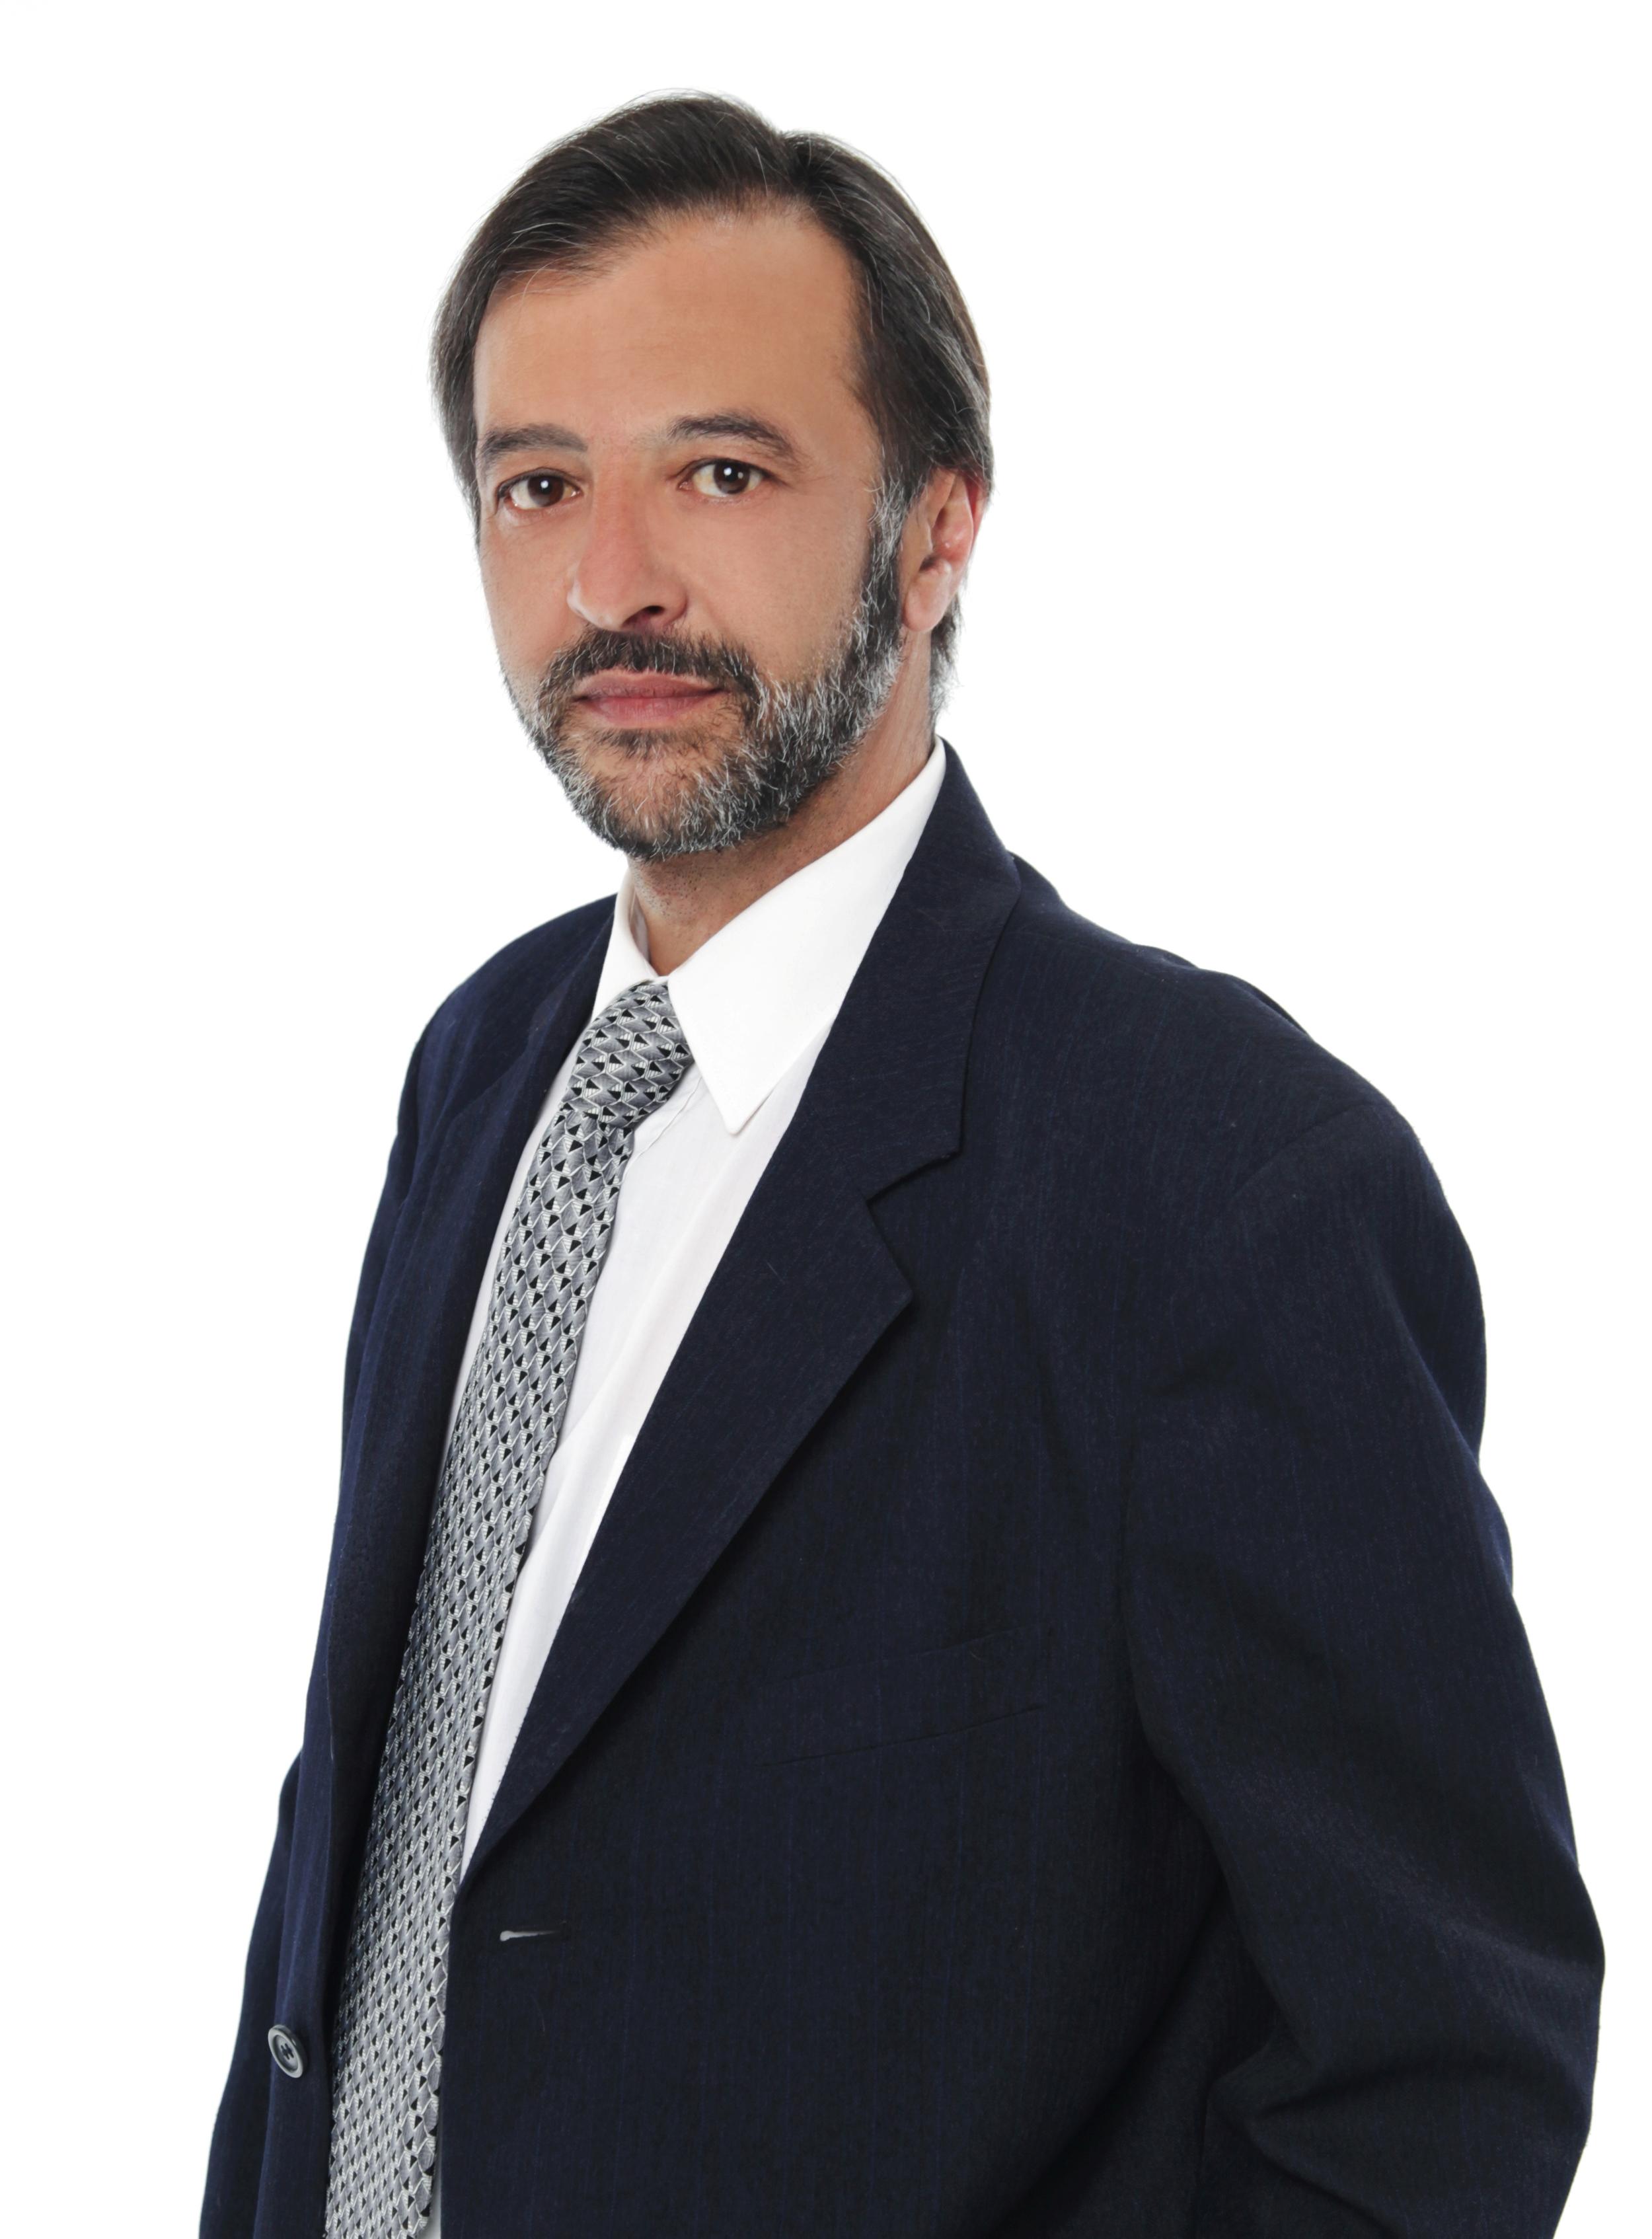 Mario Cagnone